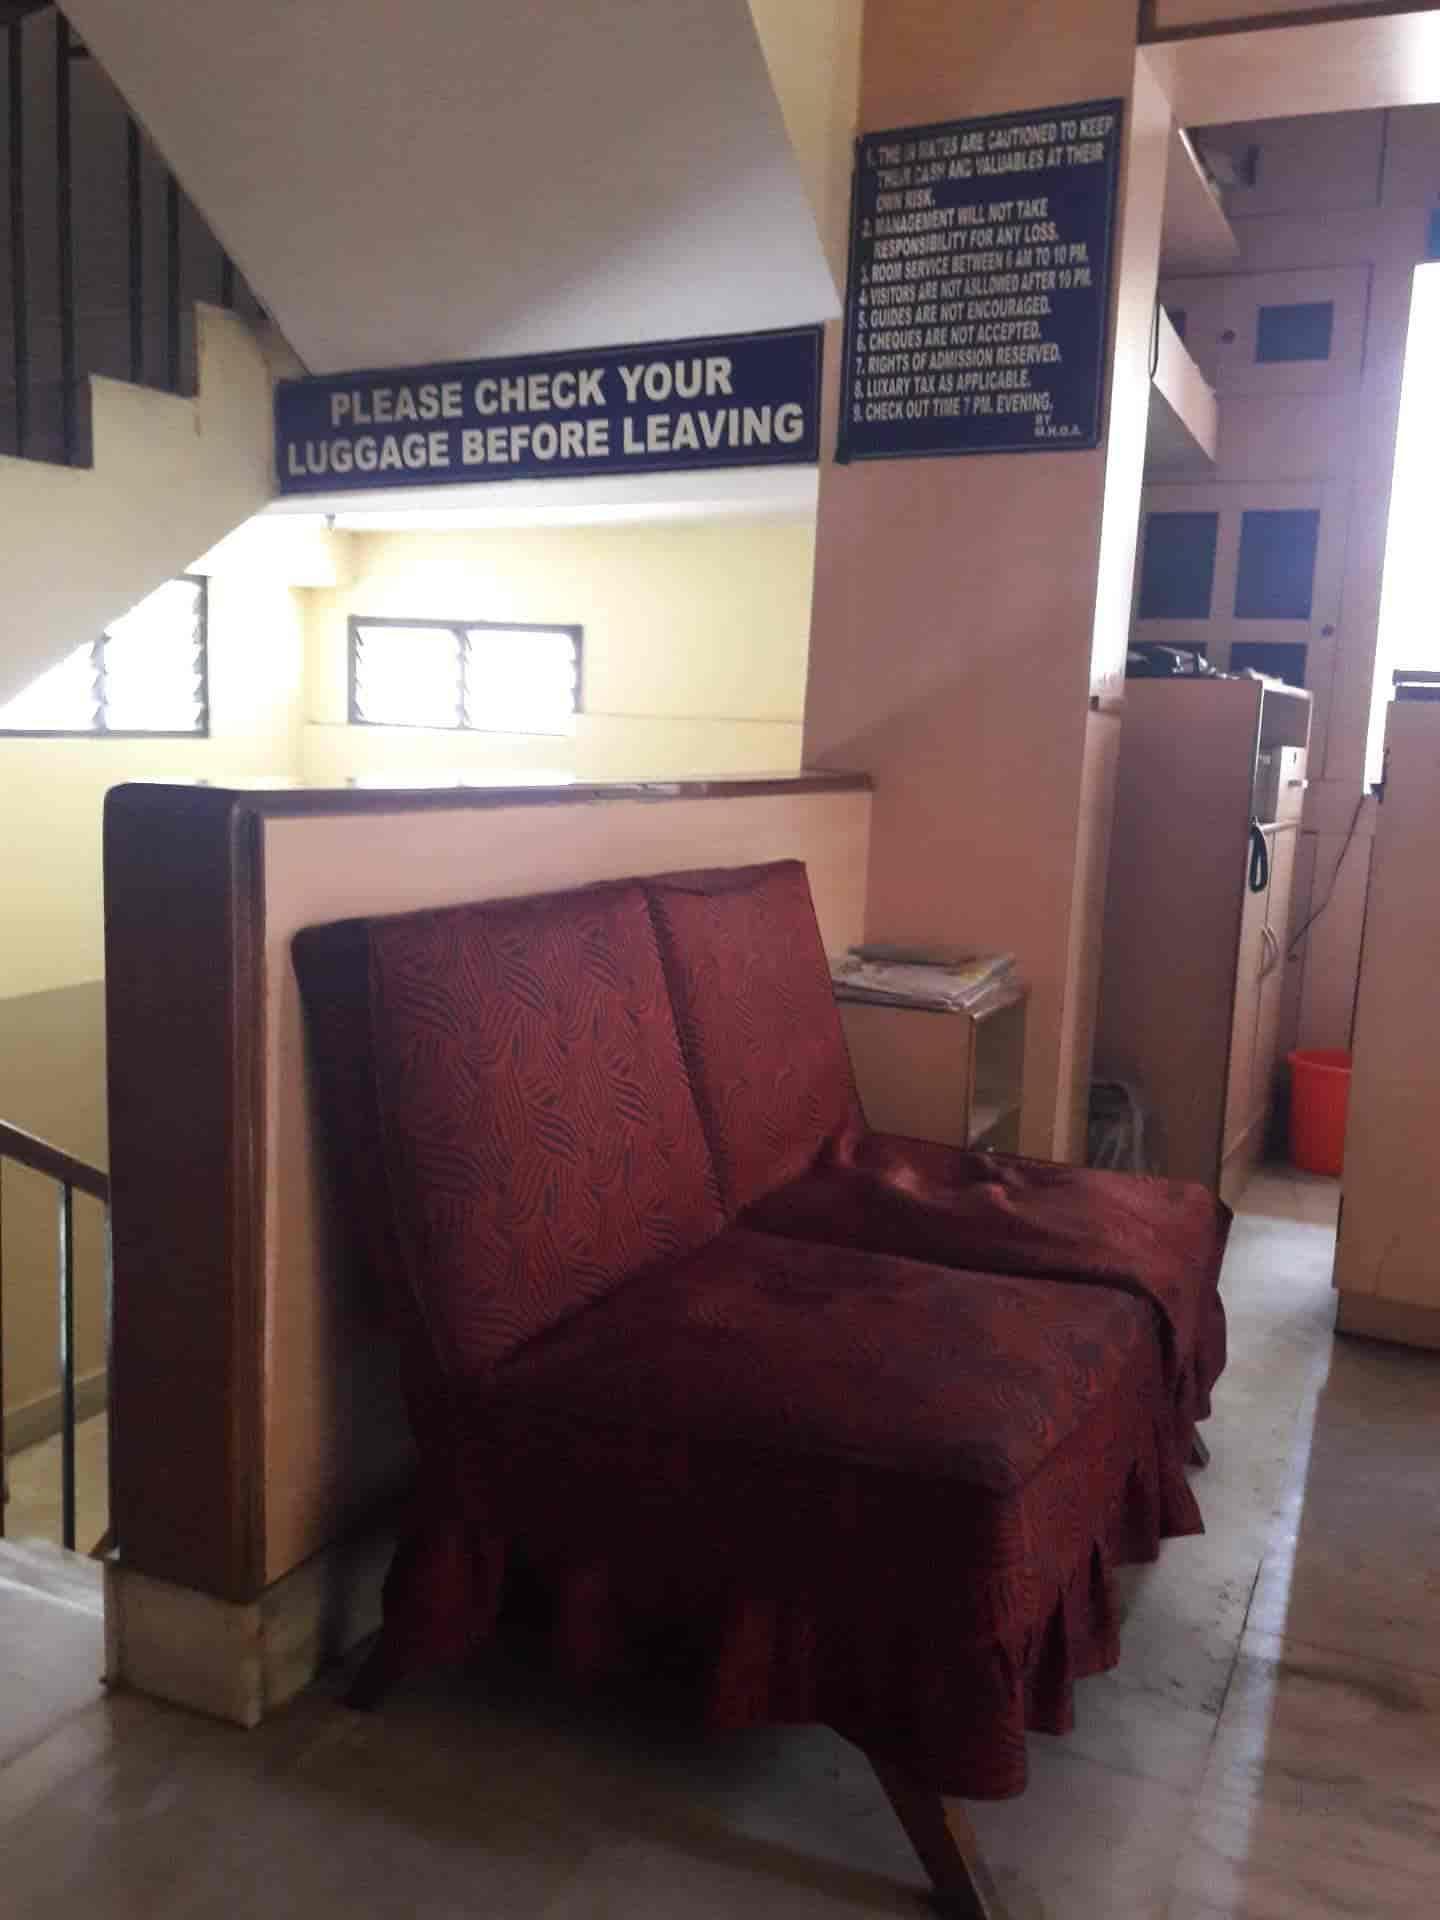 Hotel Garden City, Bennimantap - Hotels in Mysore - Justdial